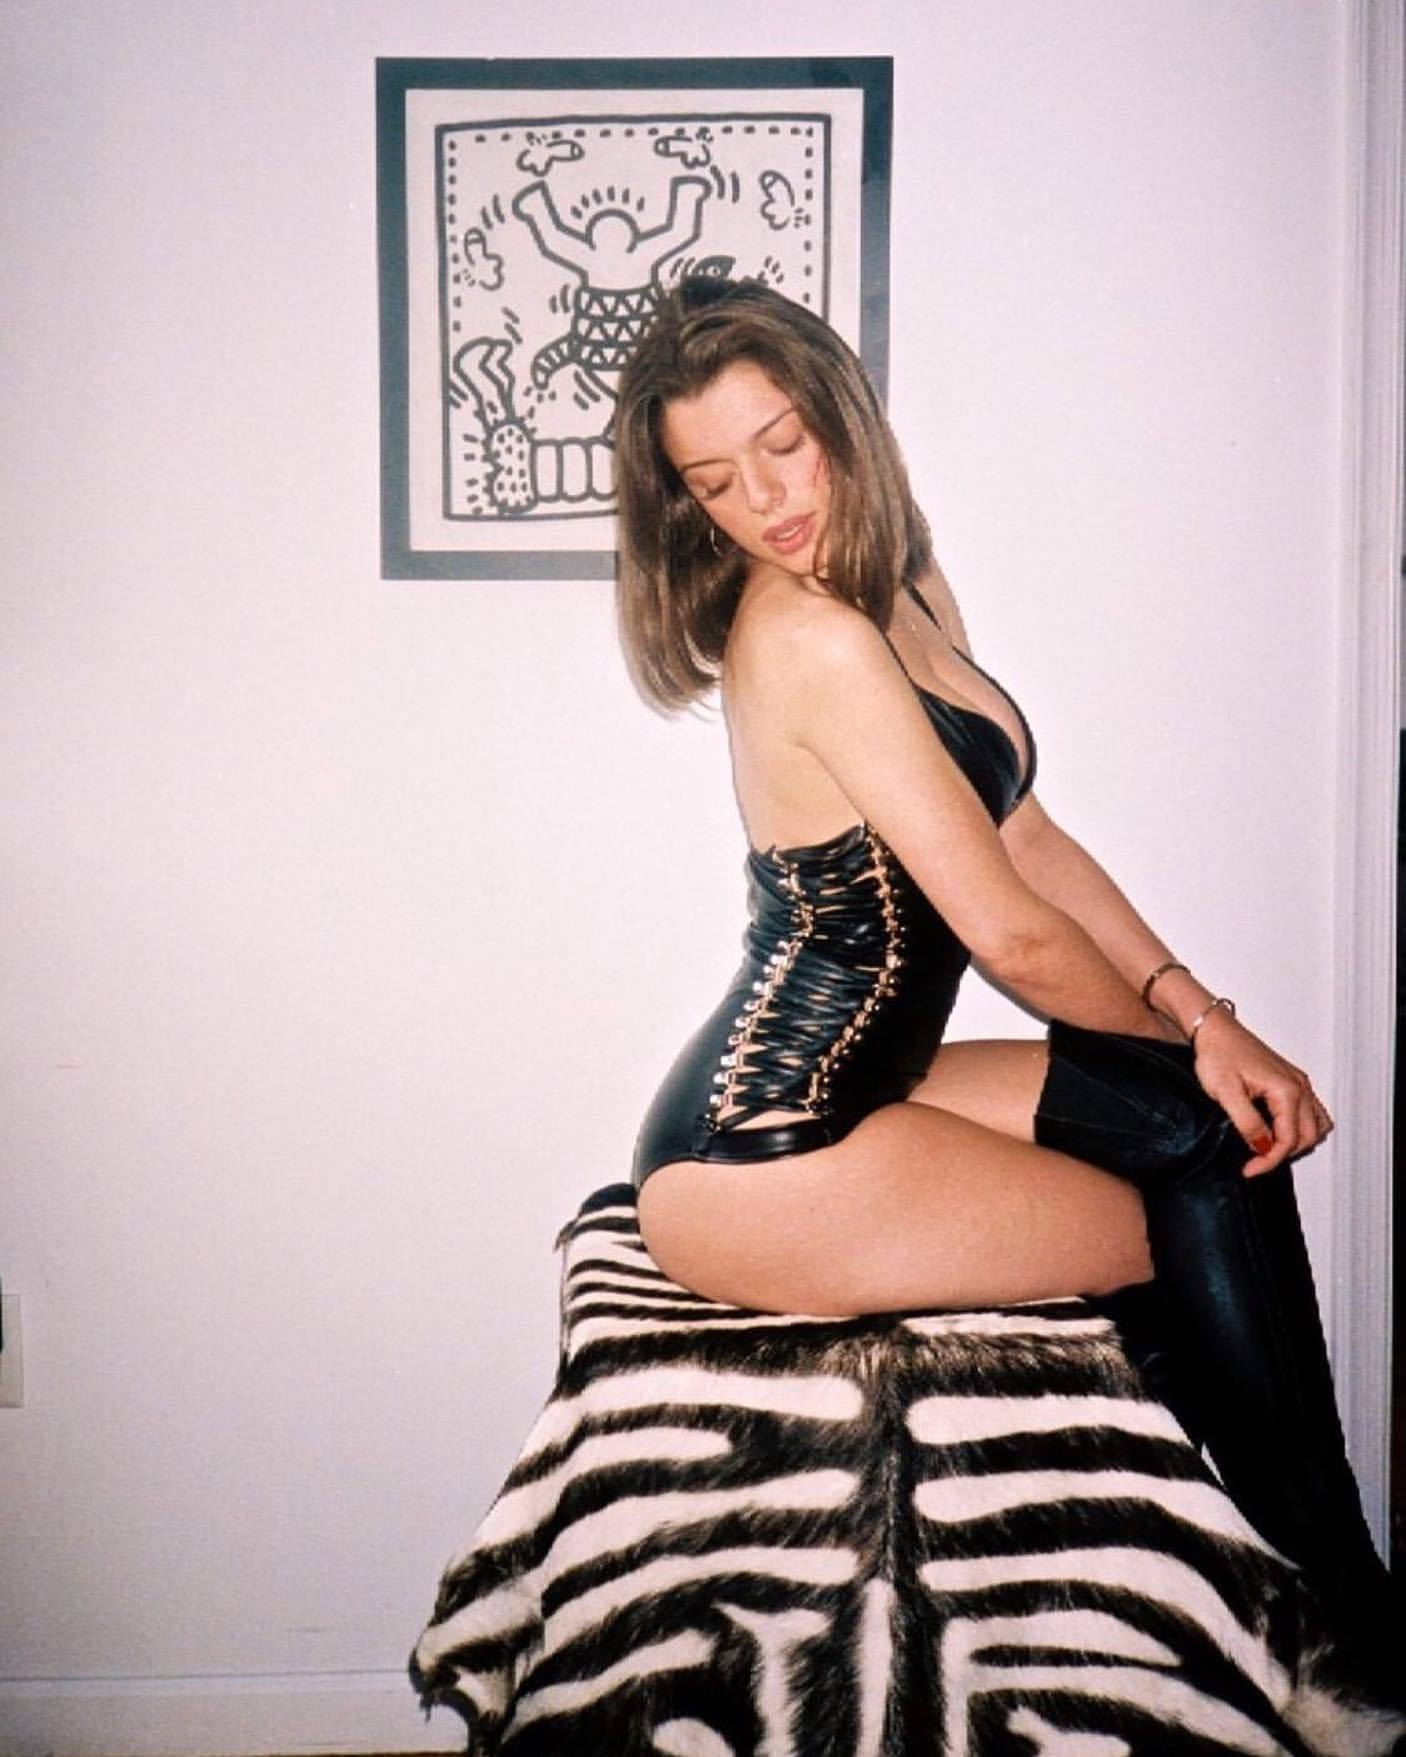 Julia Fox – Beautiful Big Boobs In Sexy Sheer Lingerie 0008